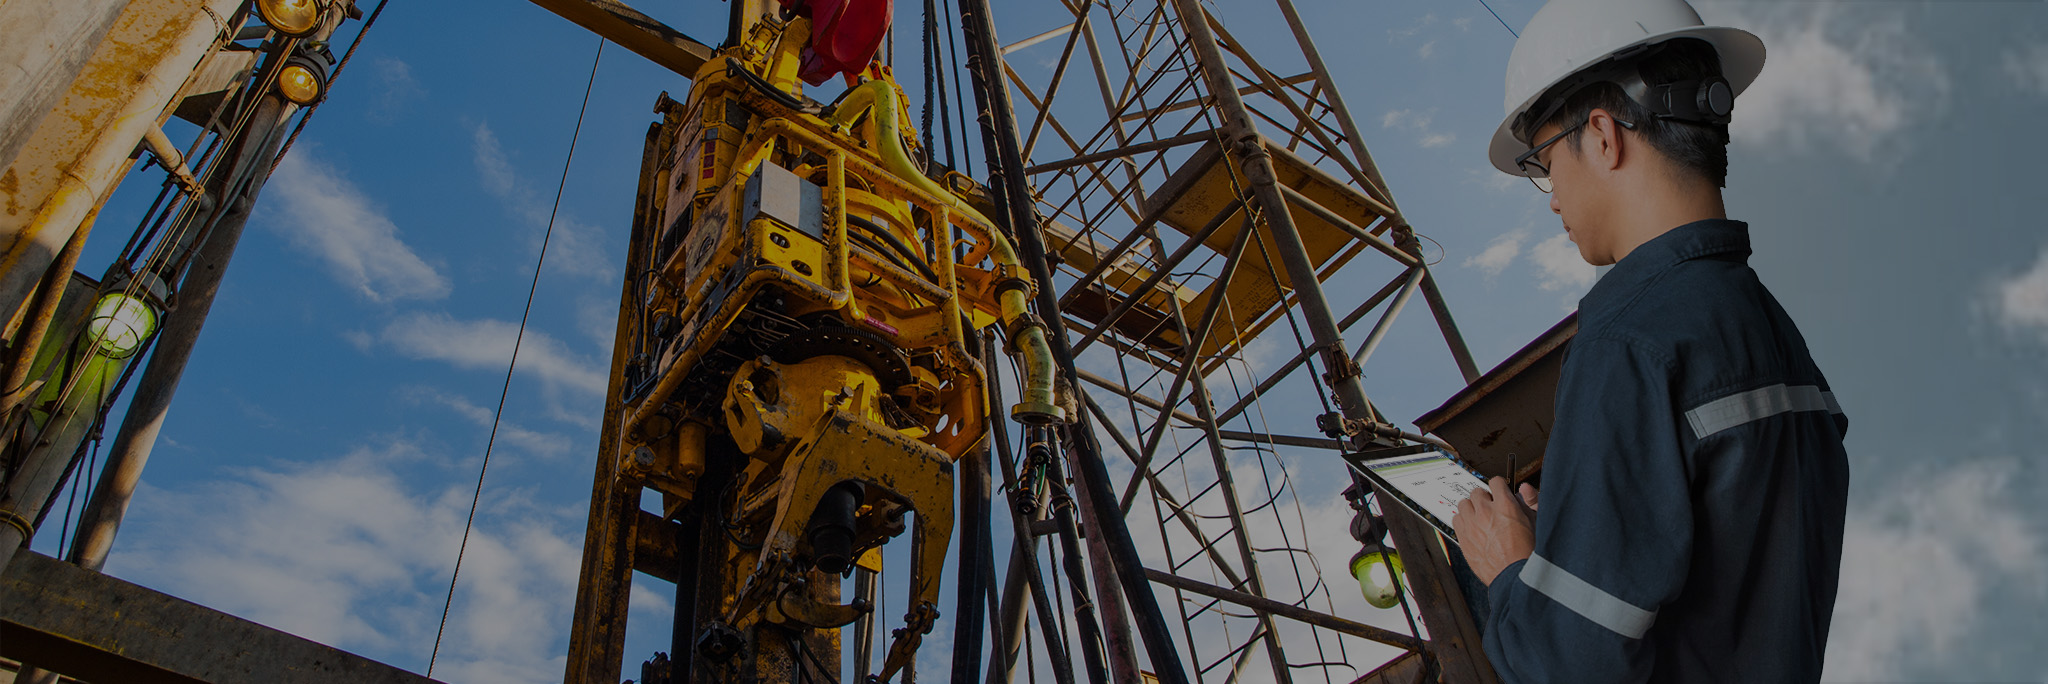 Drilling Rig Mast Inspection